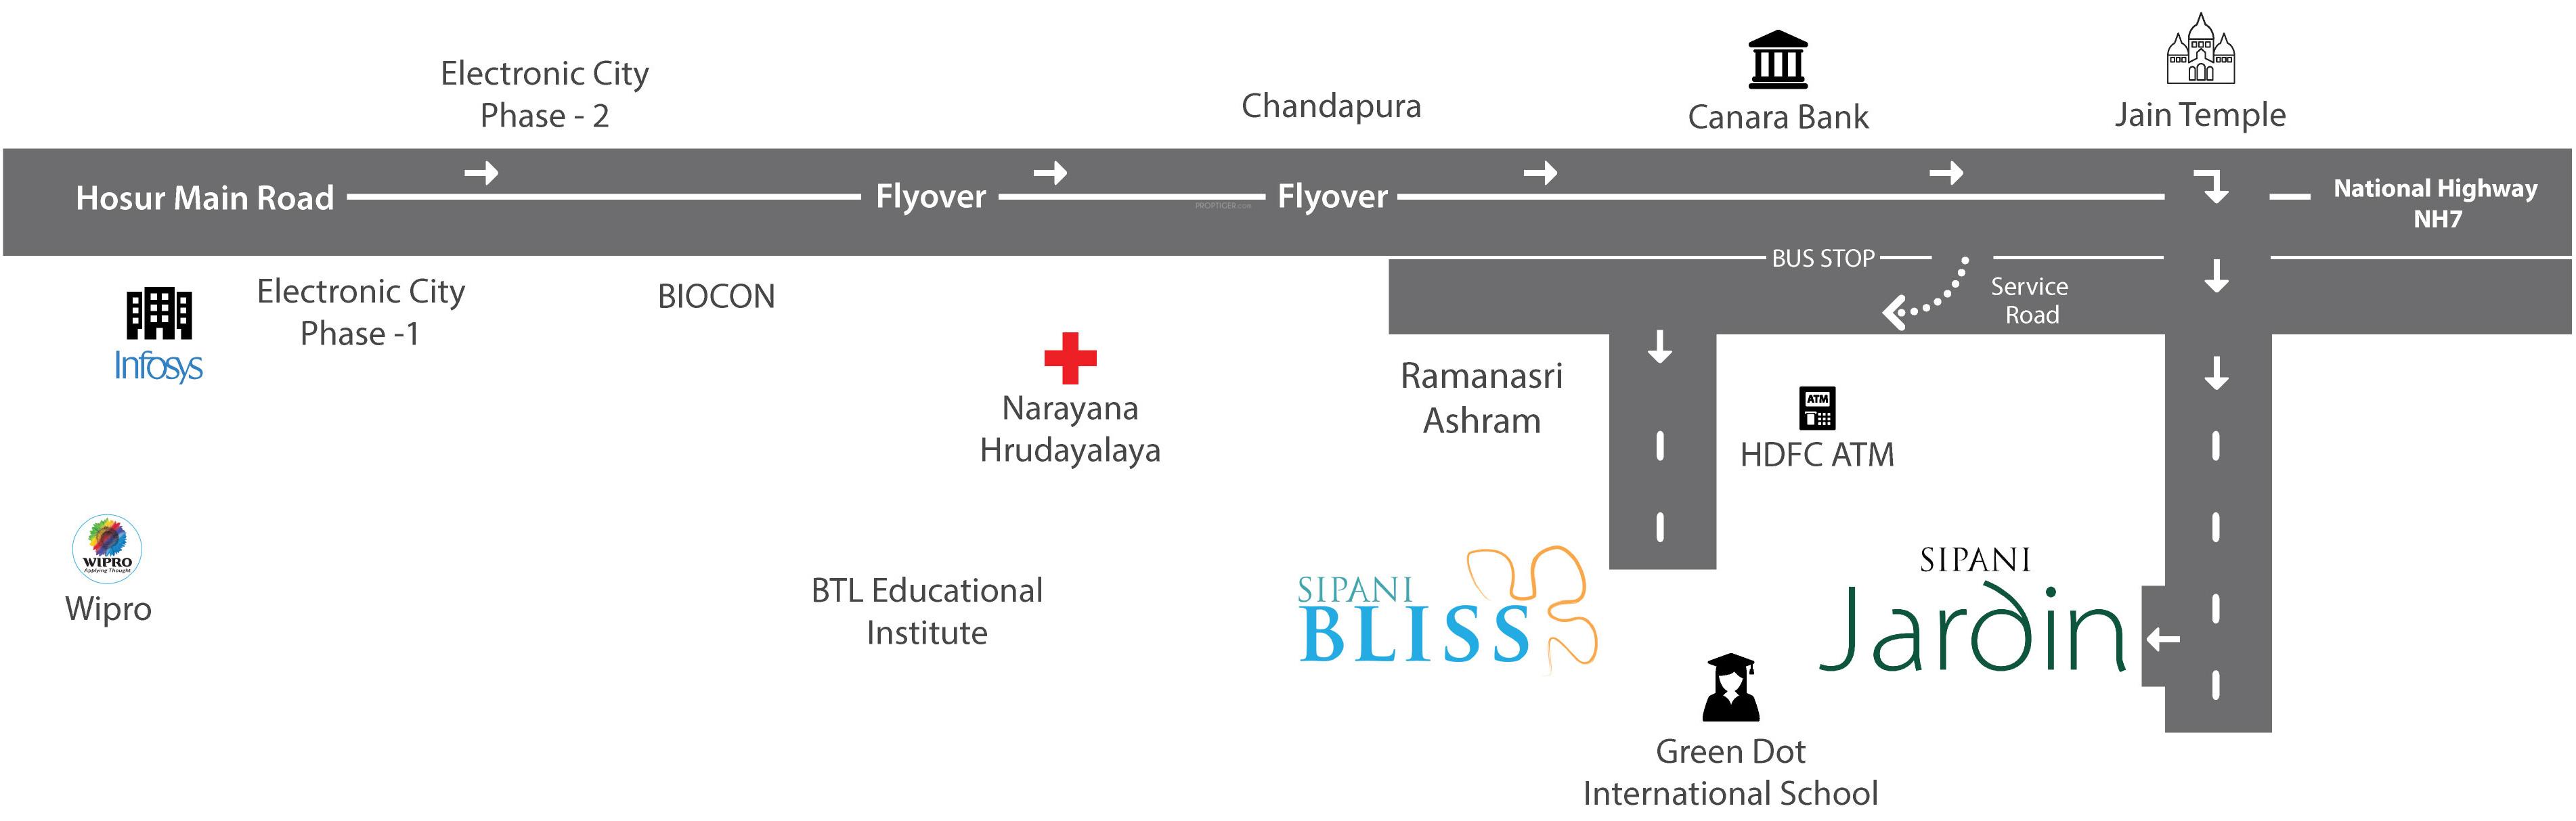 Sipani Jardin in Chandapura Bangalore Price Location Map